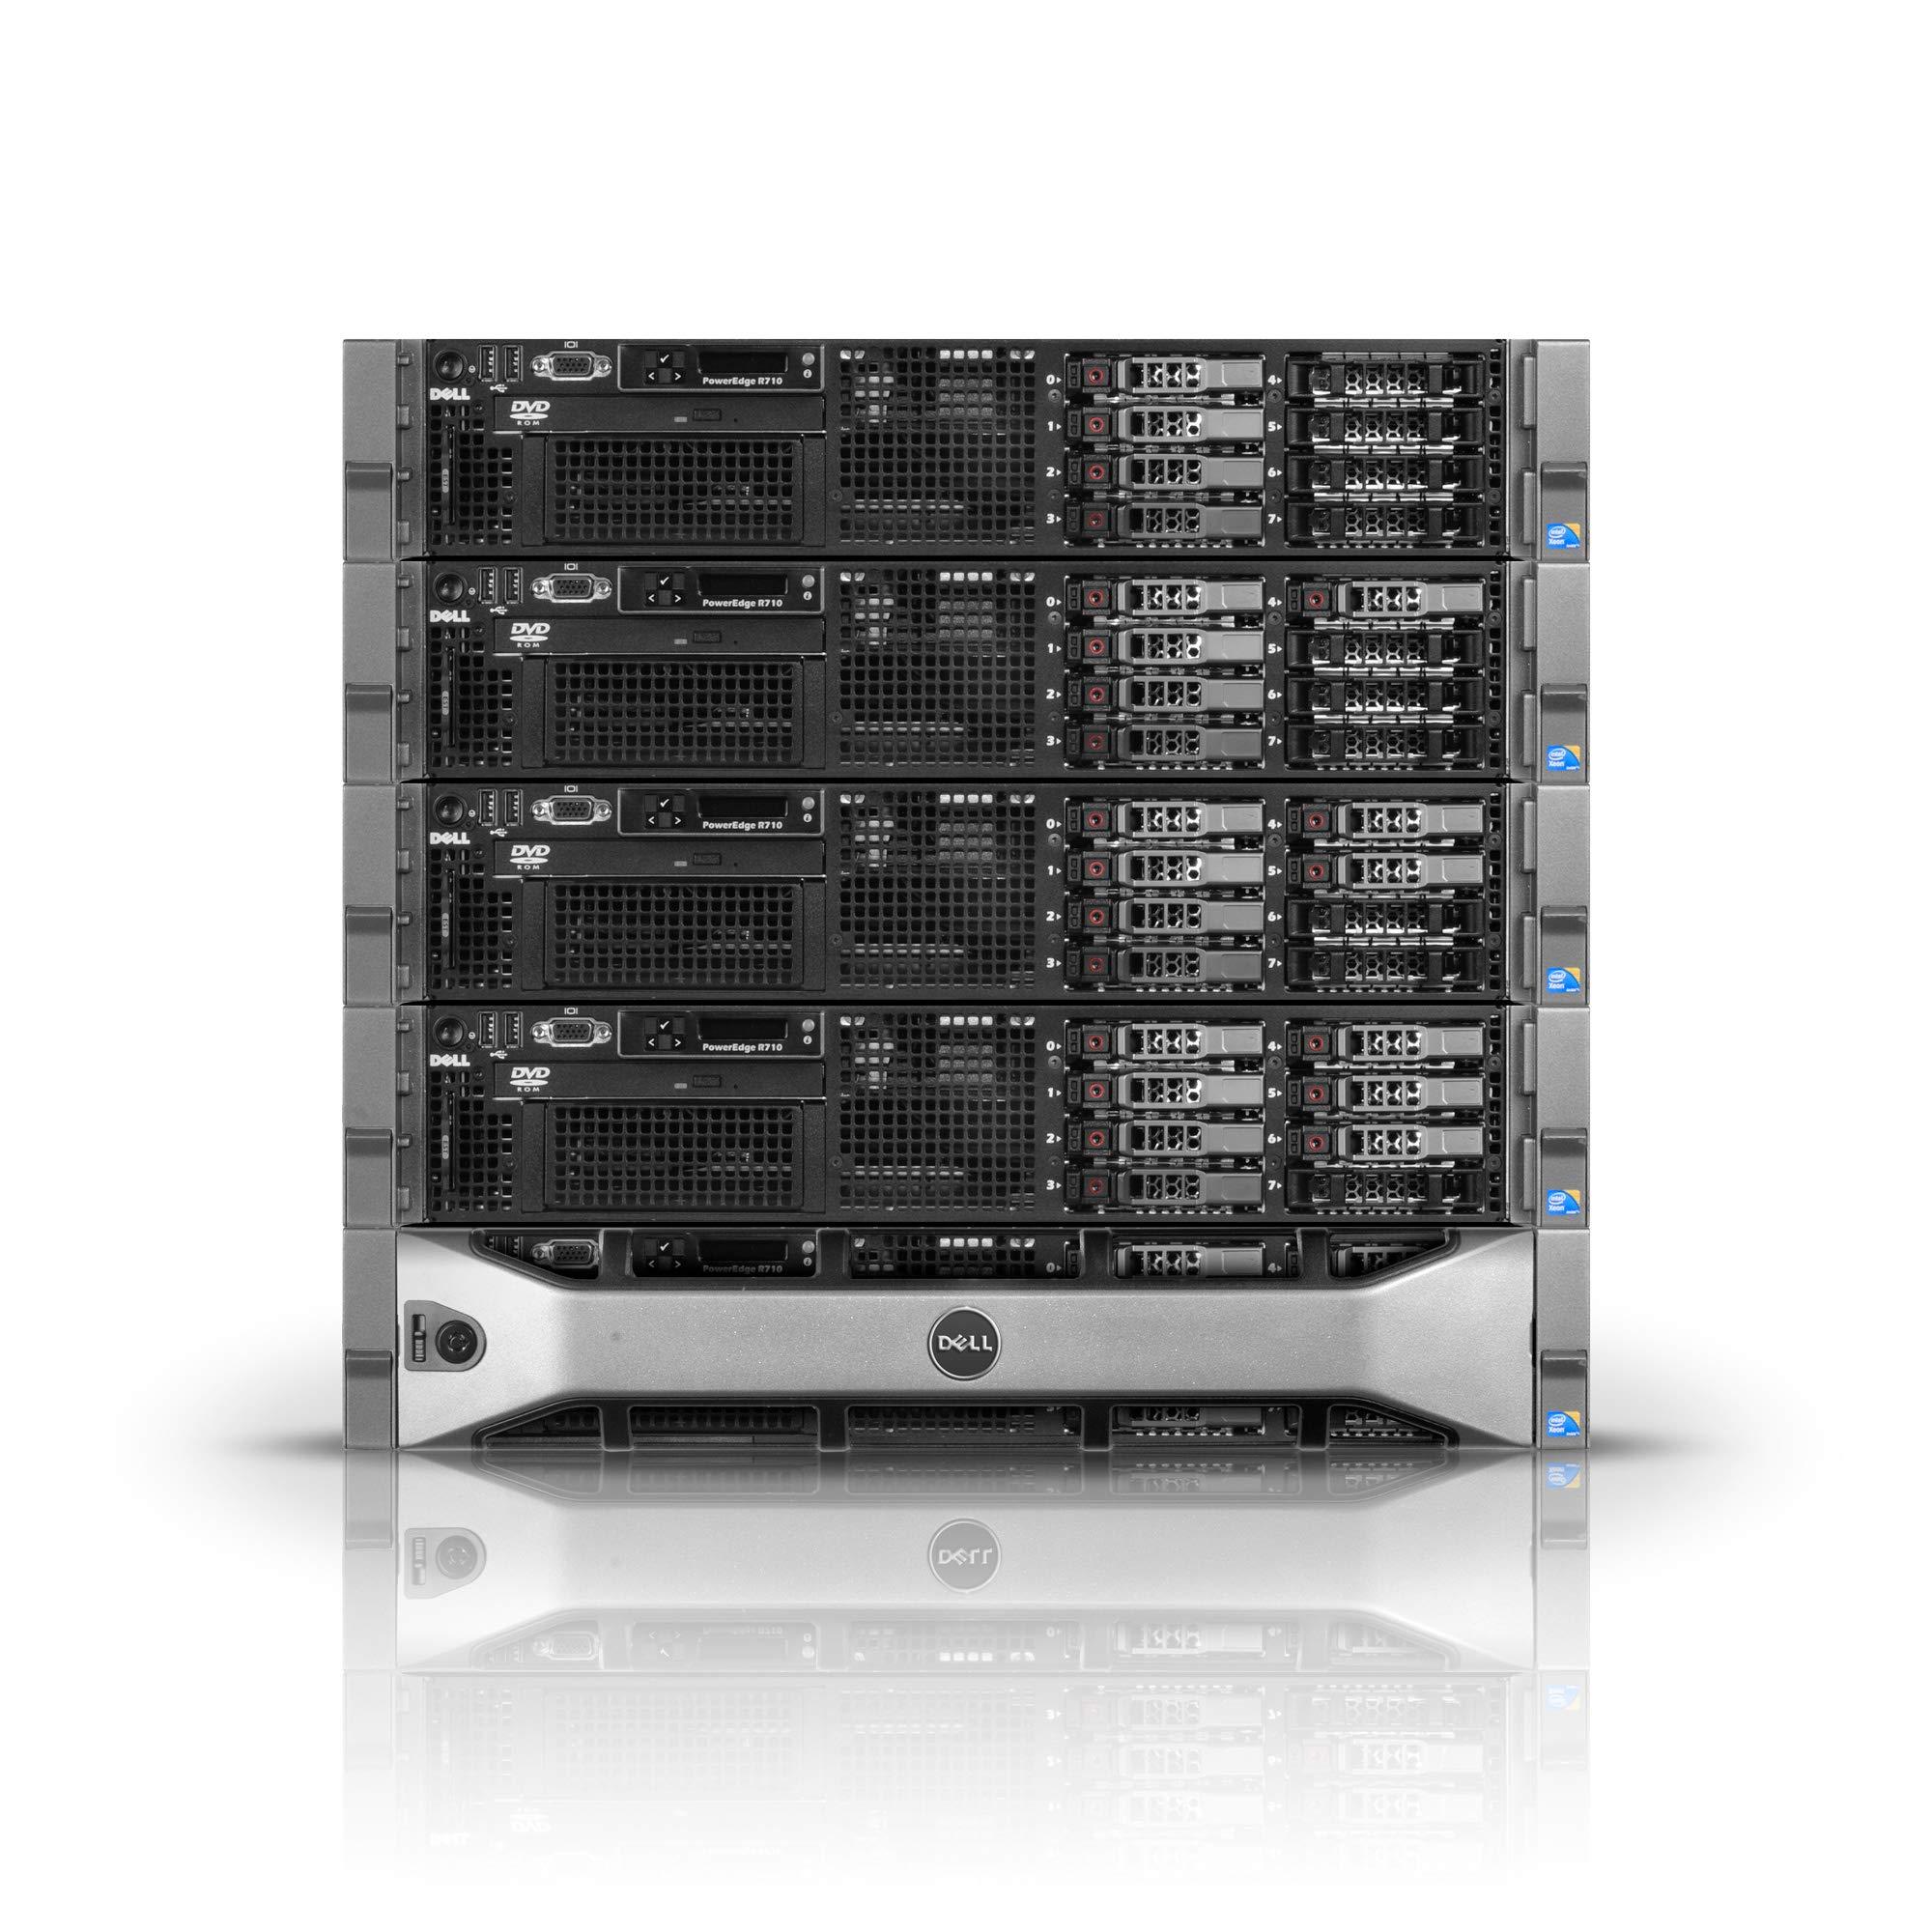 Dell PowerEdge R710 Server | 2X L5520 2.26GHz=Quad Core | 32GB RAM | Perc 6i | 2X 300GB SAS (Renewed)